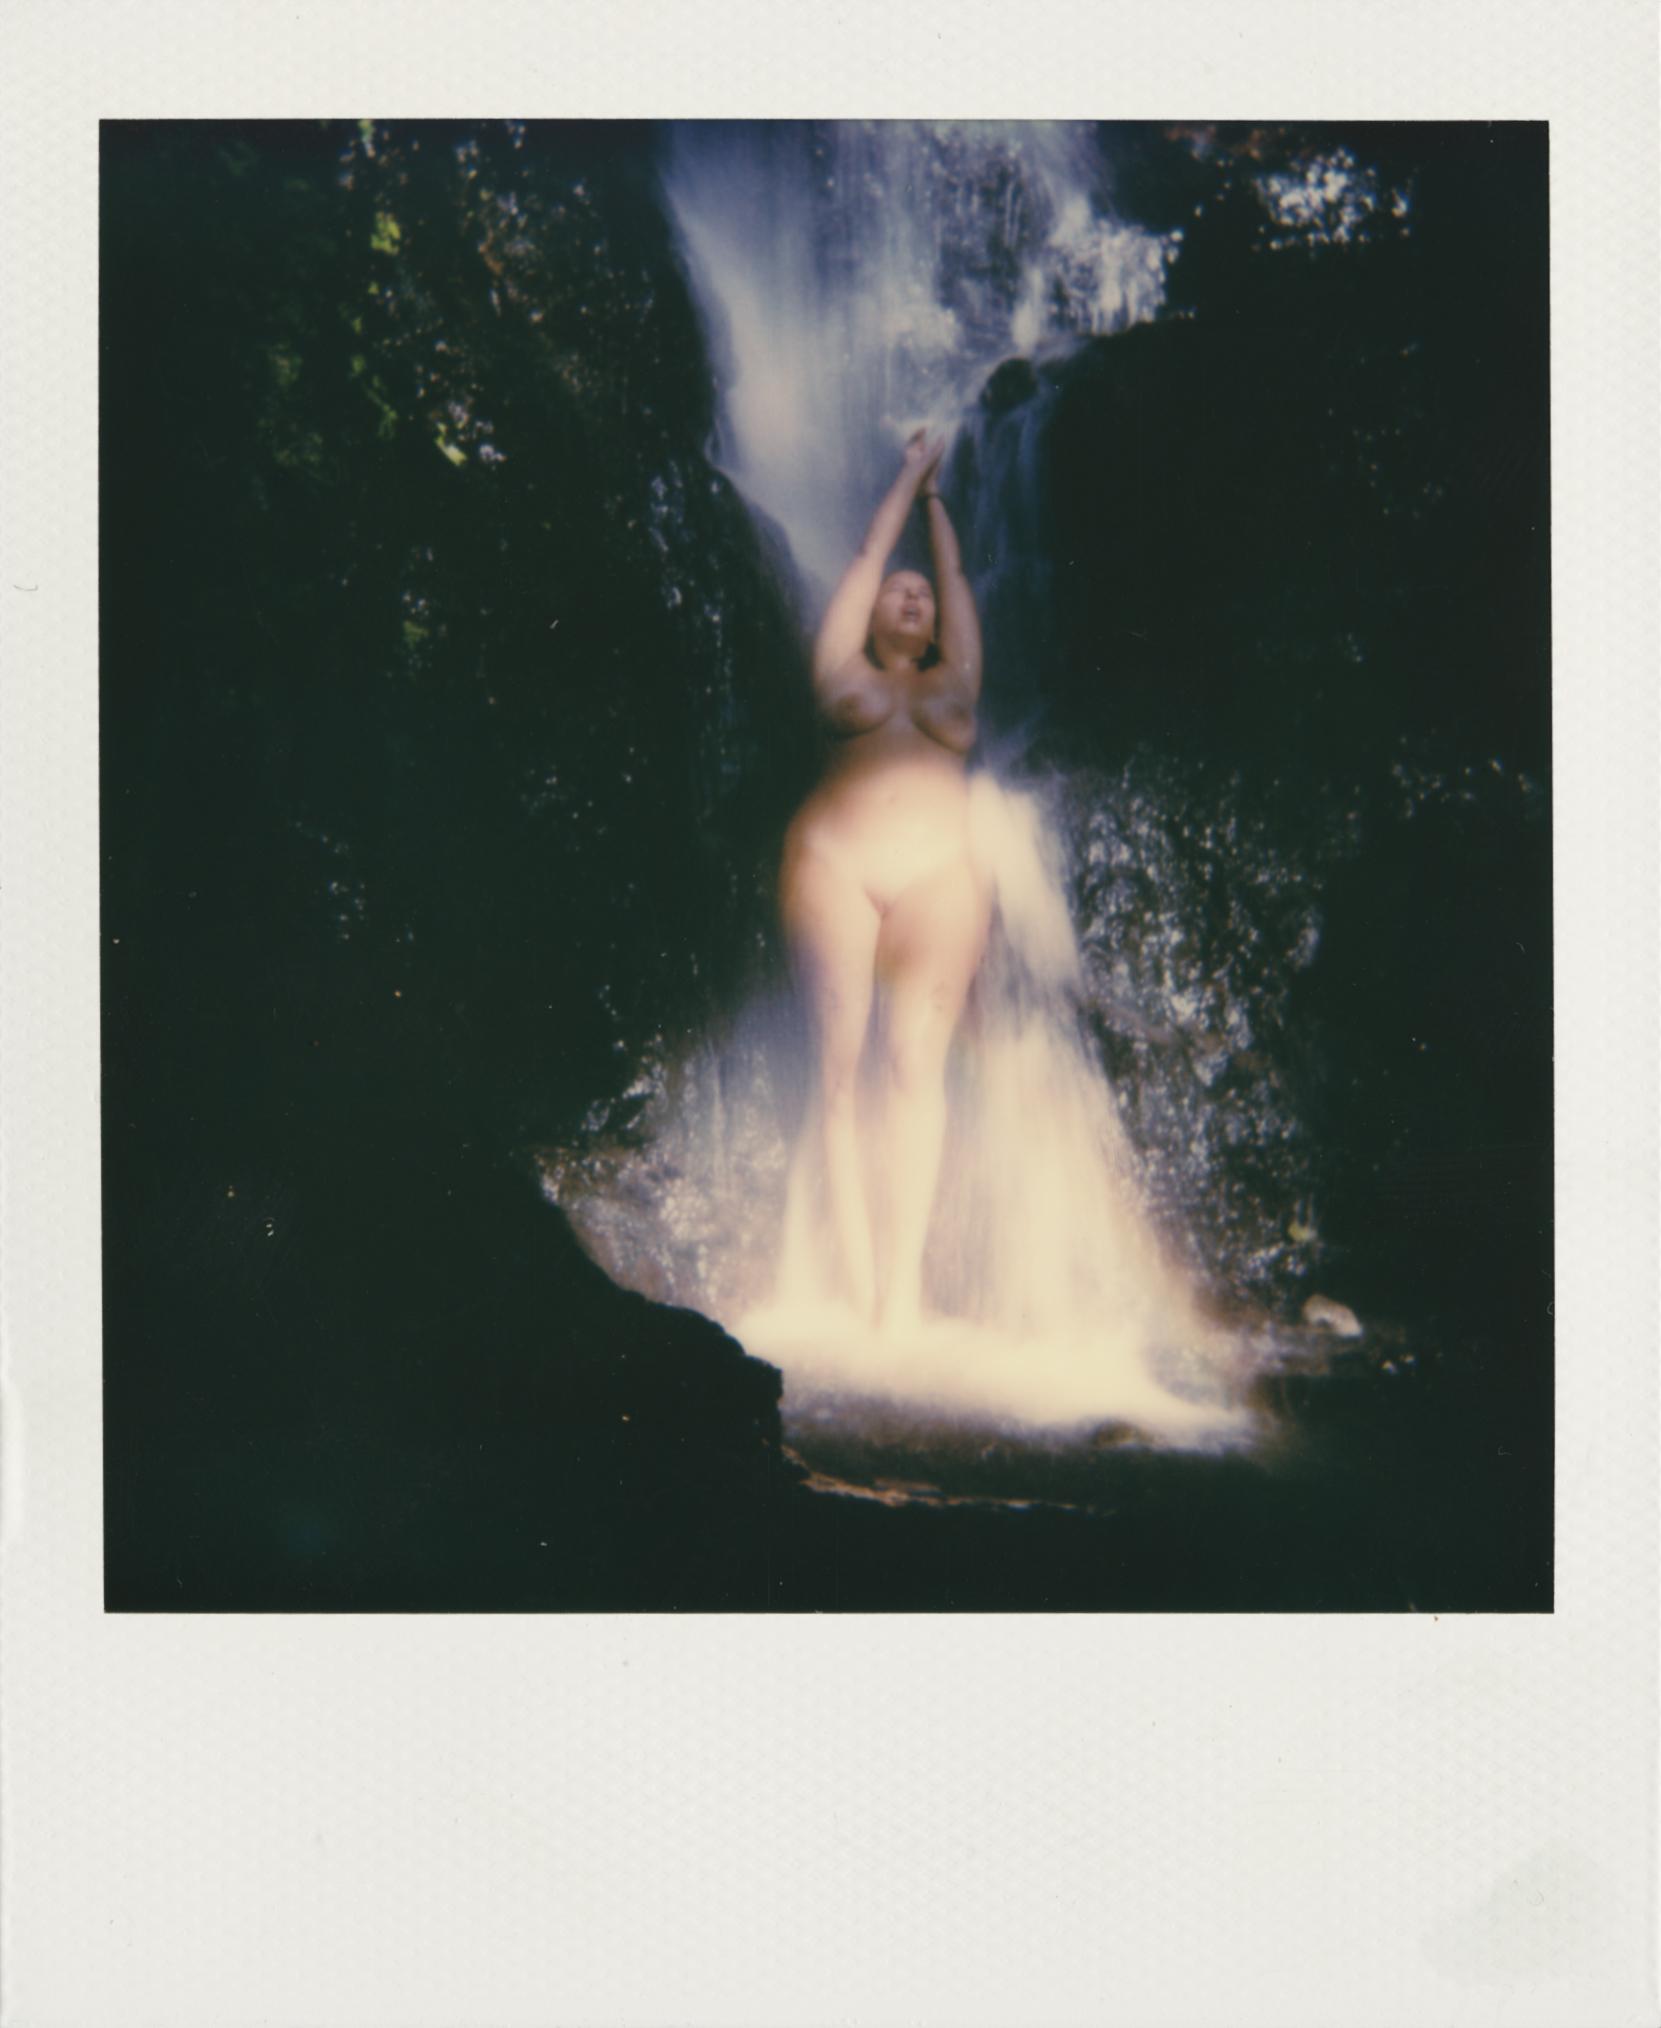 Waterfall_02.jpg